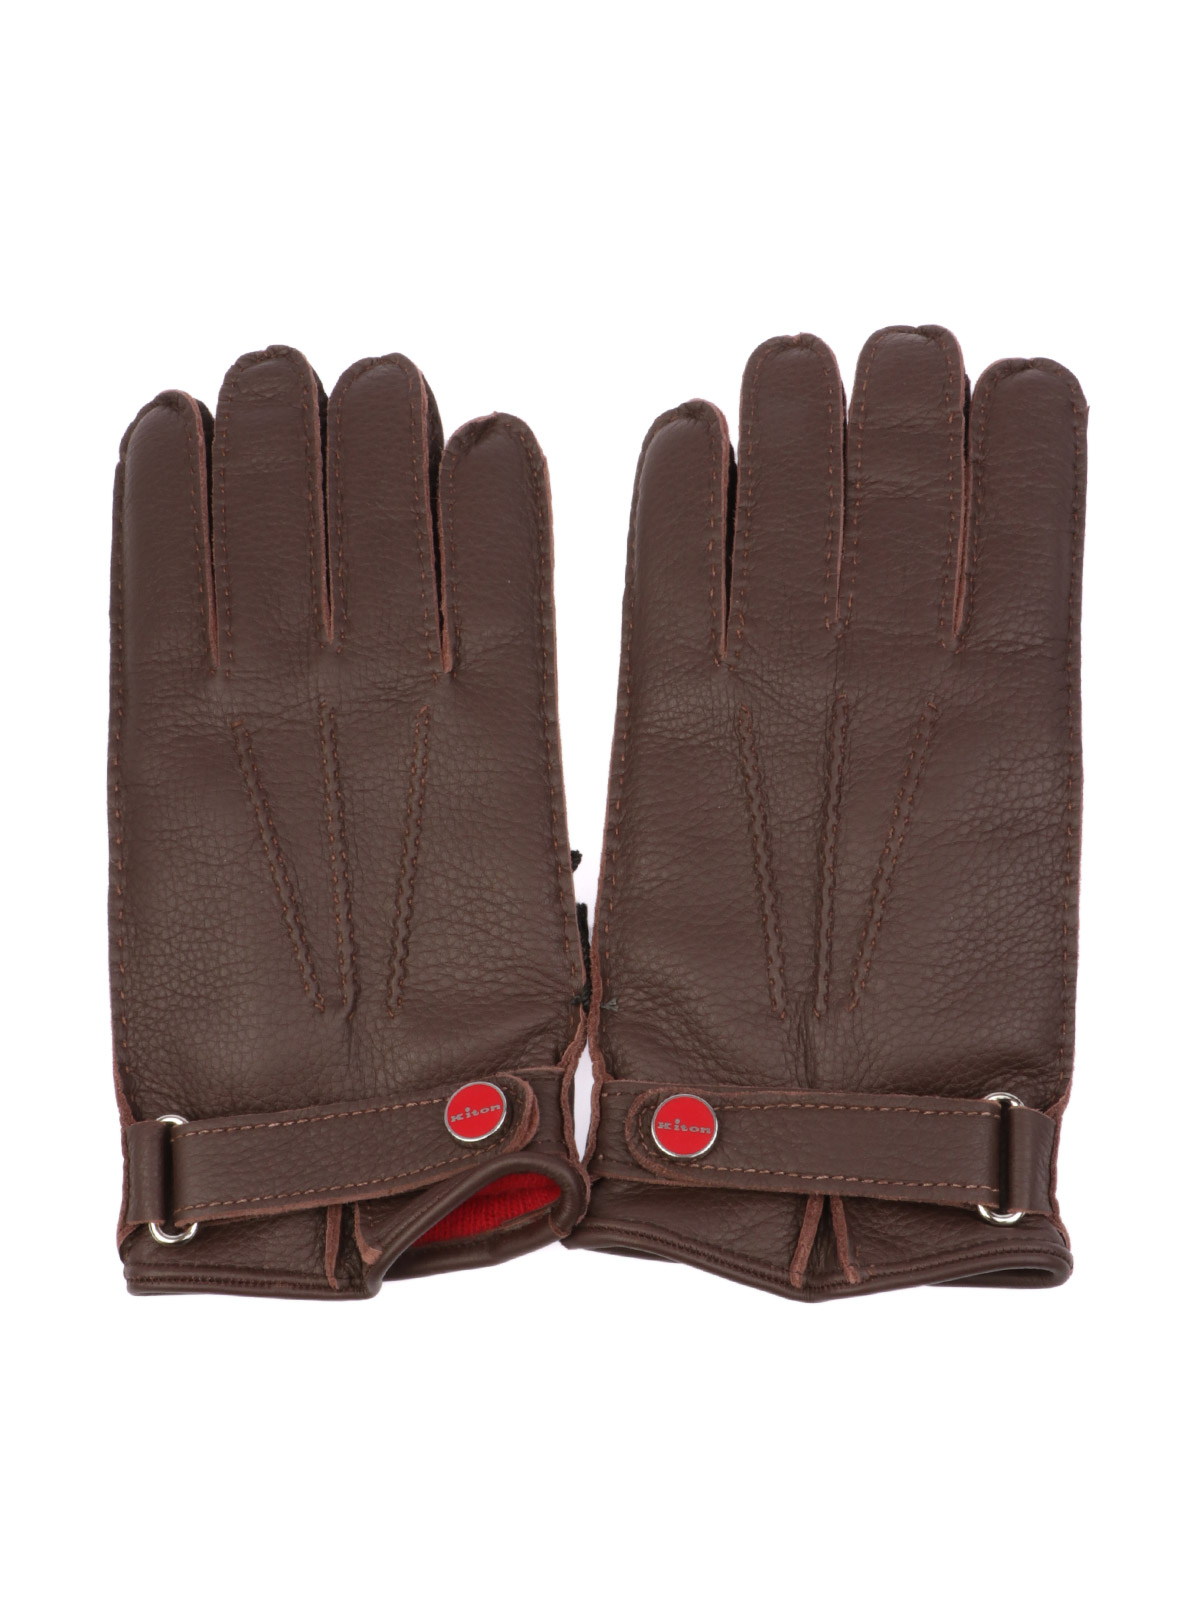 Picture of Kiton | Gloves Guanti Uomo